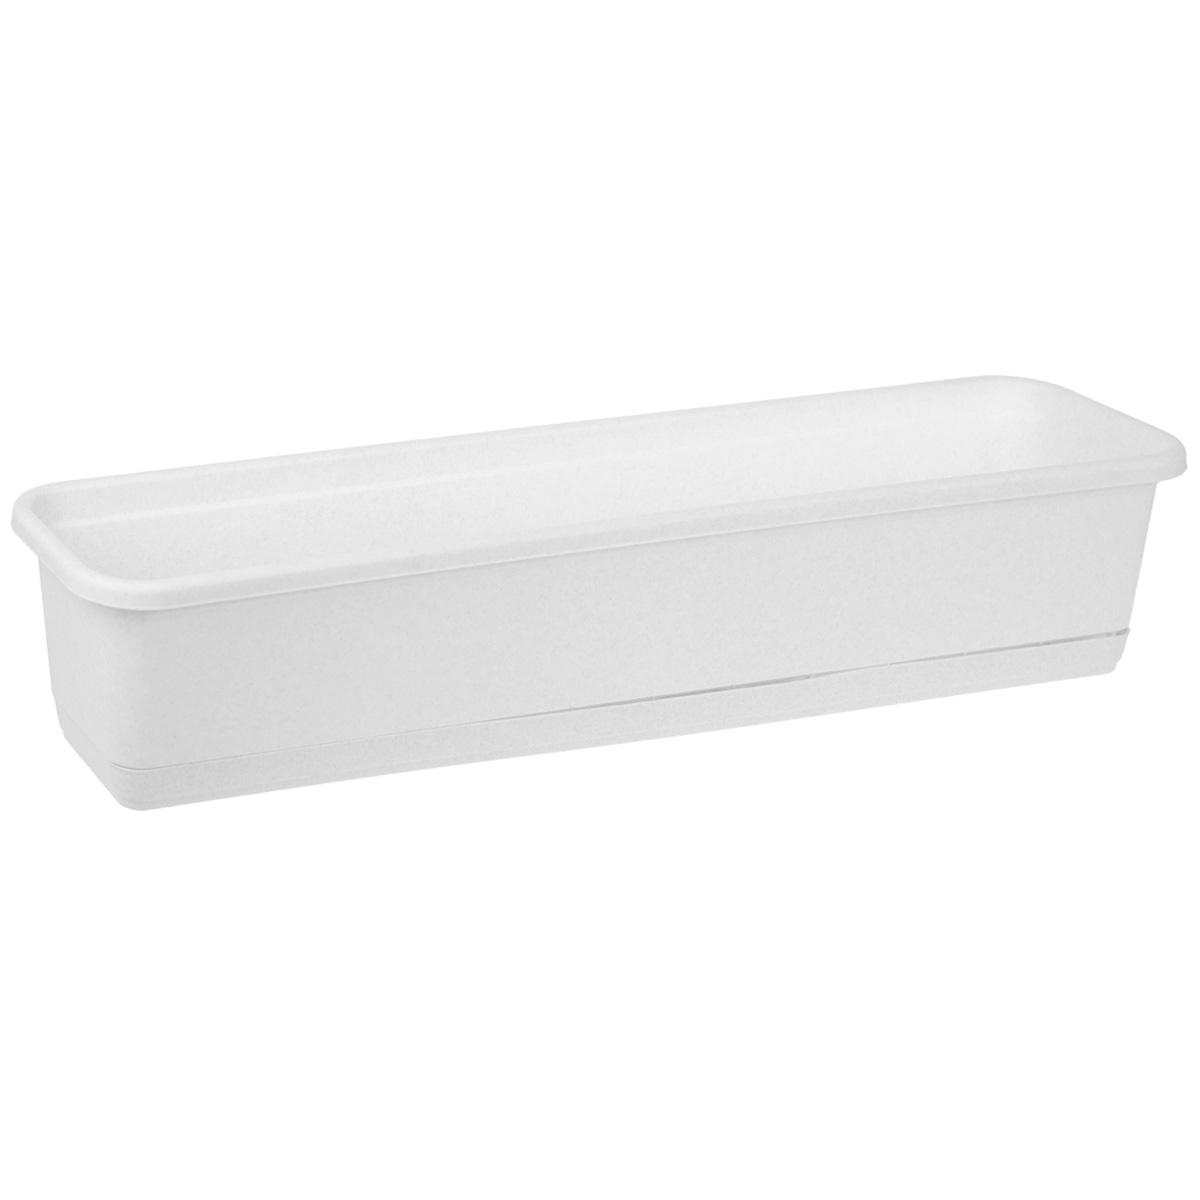 Балконный ящик Idea, цвет: мраморный, 80 см х 18 см ящик балконный santino 60 х 19 х 15 см